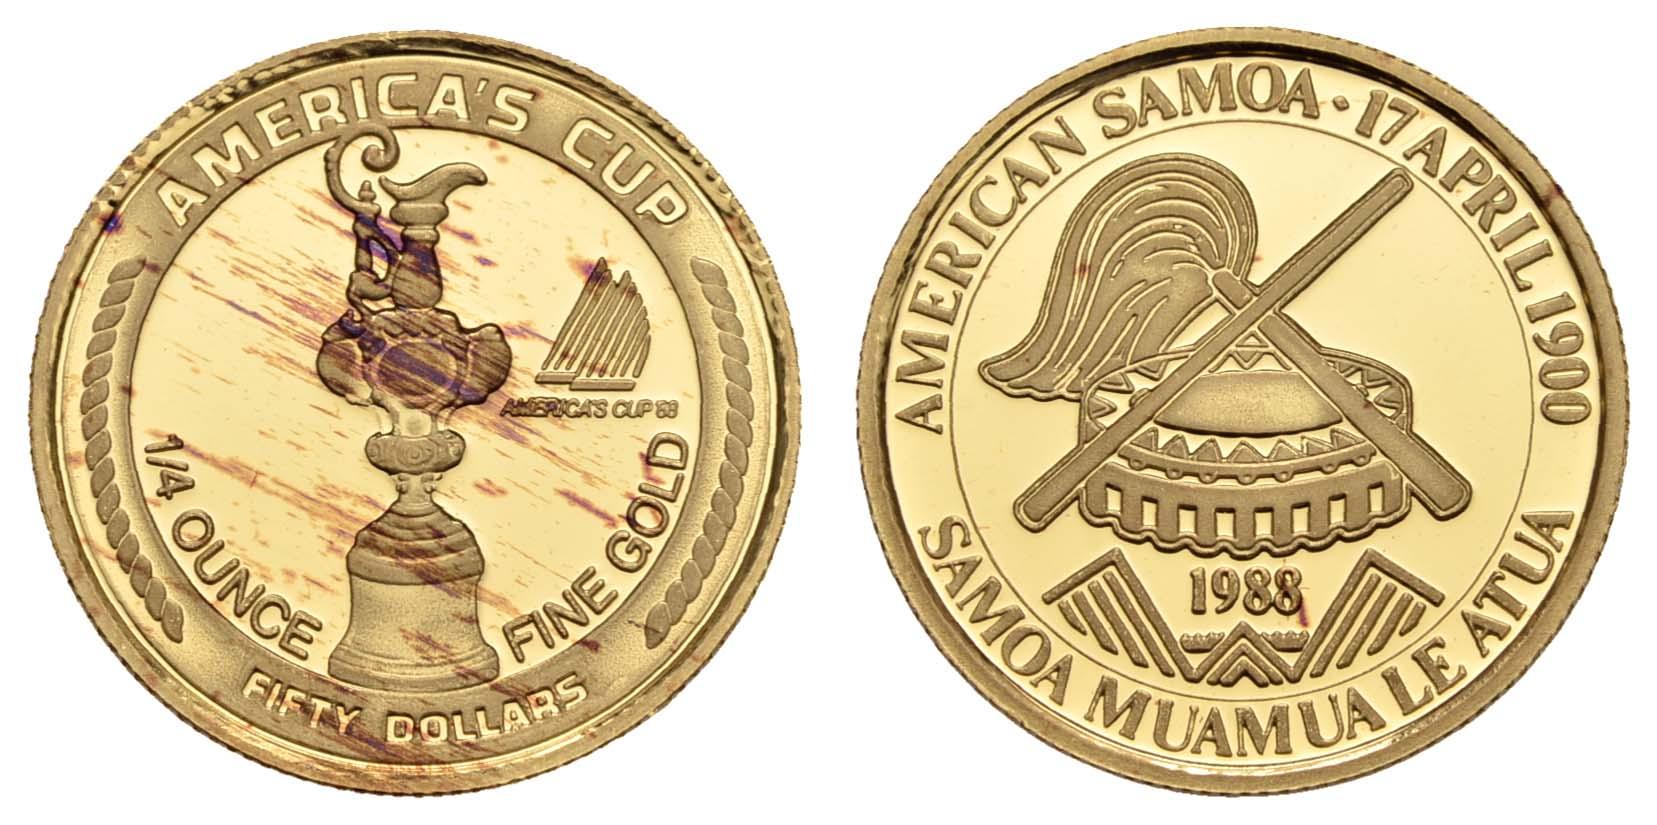 Lot 2106 - übersee samoa -  Auktionshaus Ulrich Felzmann GmbH & Co. KG Coins single lots